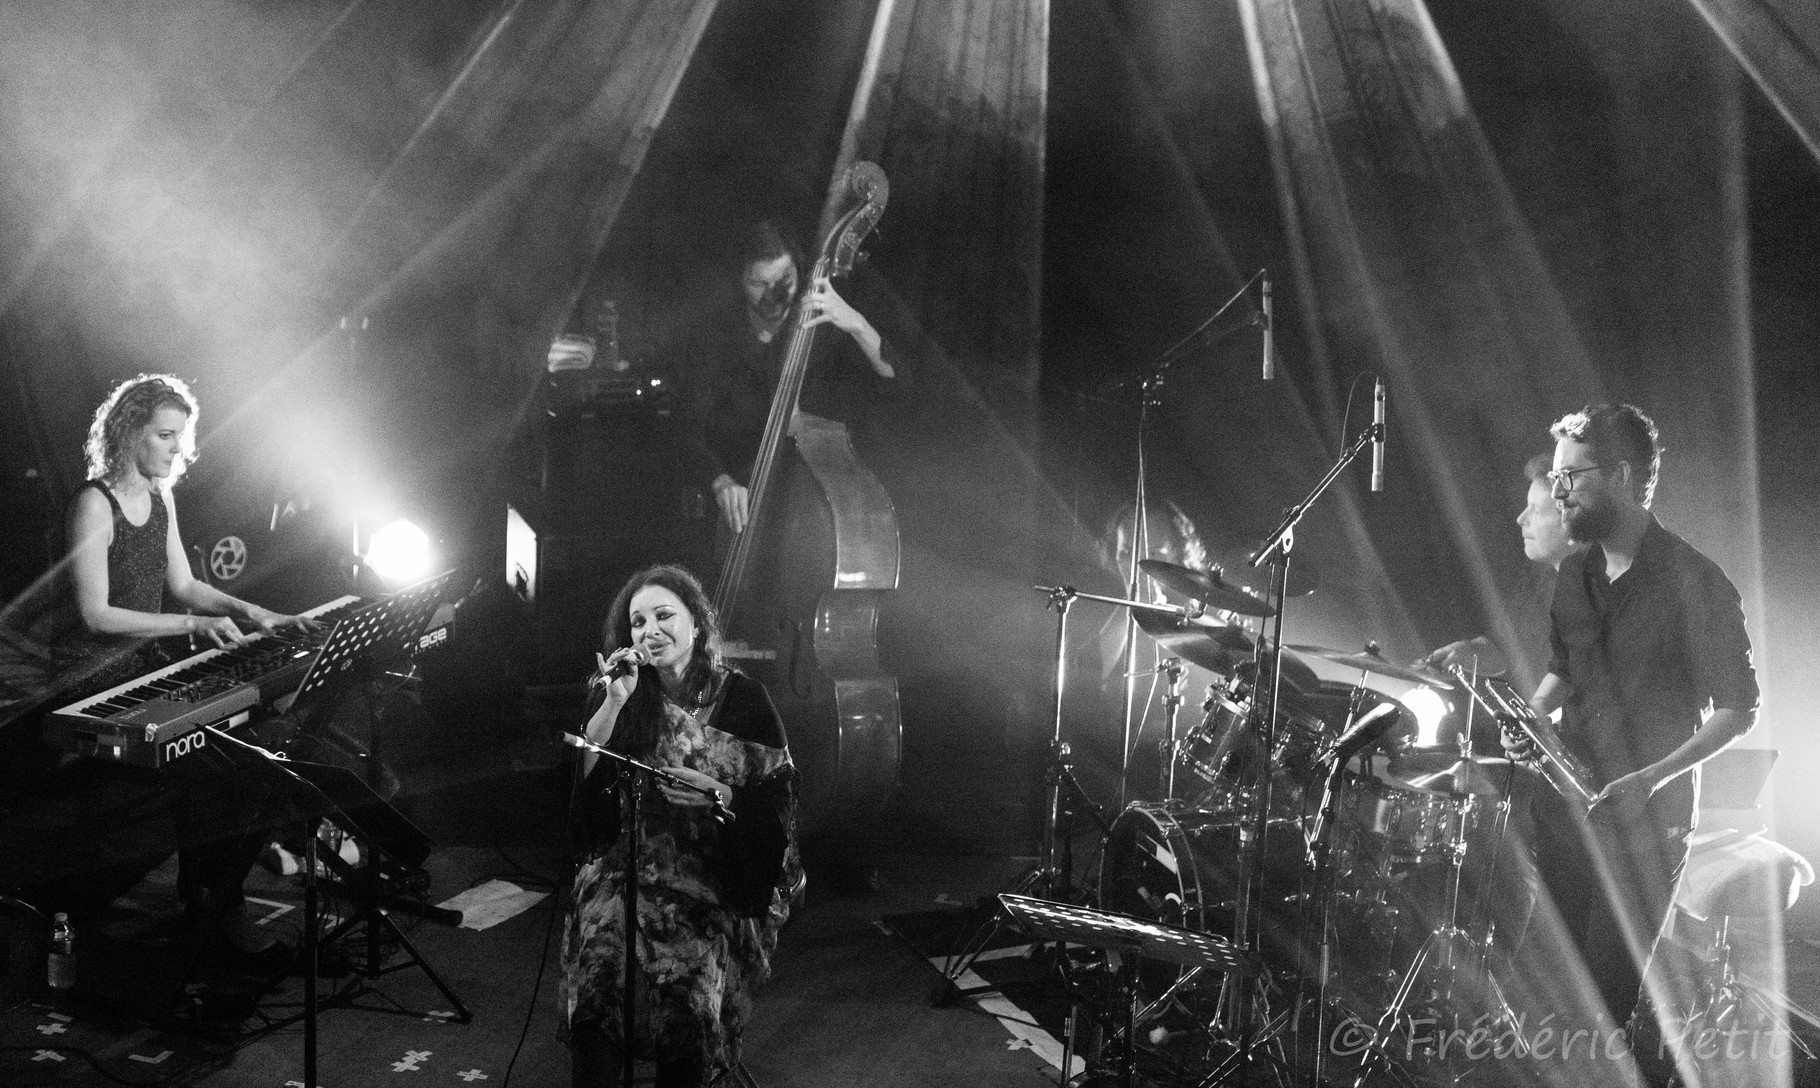 14 octobre 2015 - Natacha Atlas @ Divan du Monde (MaMA Festival)